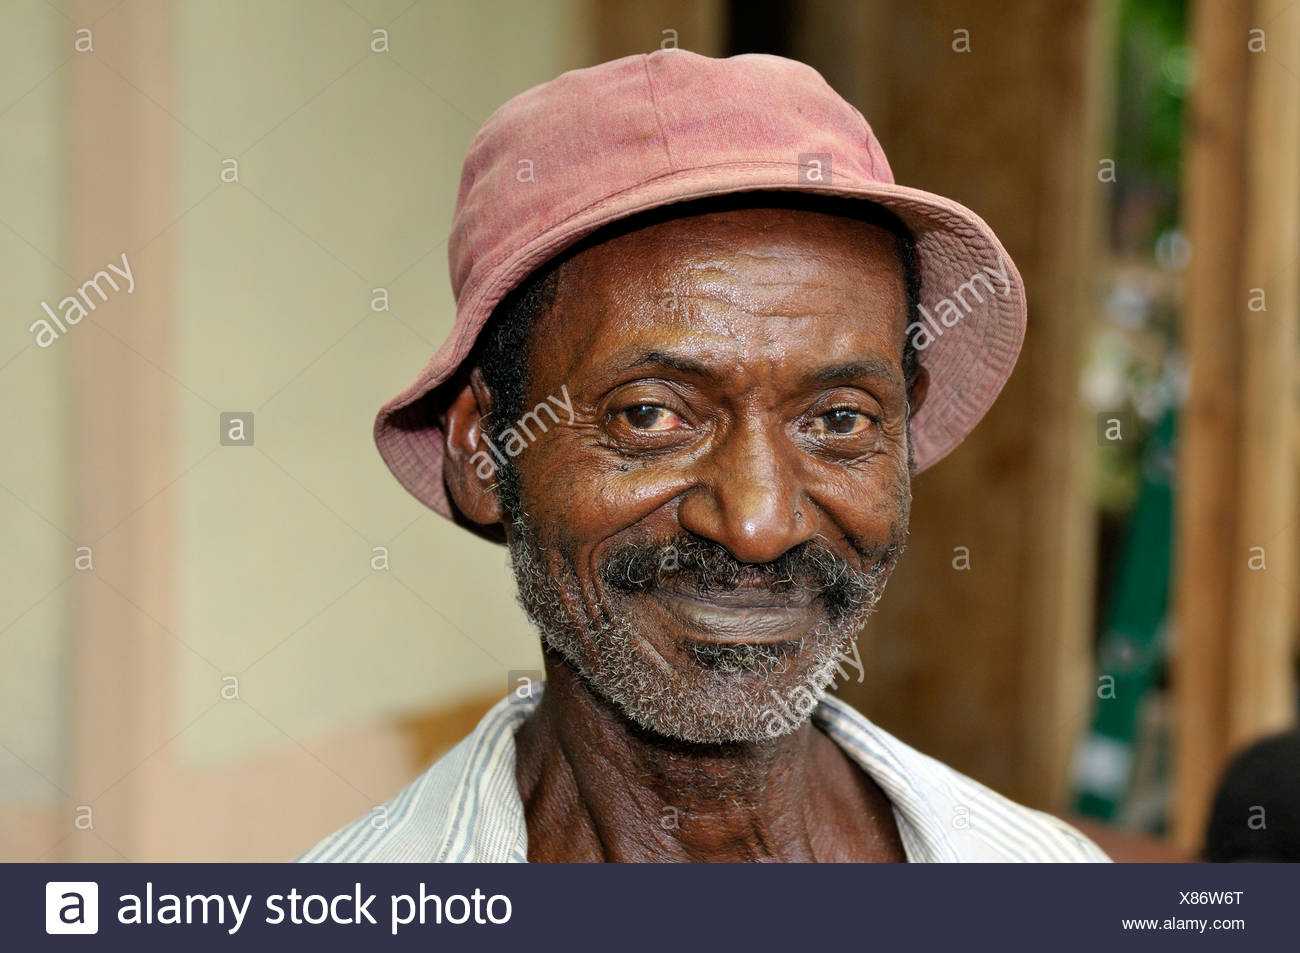 Caribbean Men: Caribbean Native Stock Photos & Caribbean Native Stock